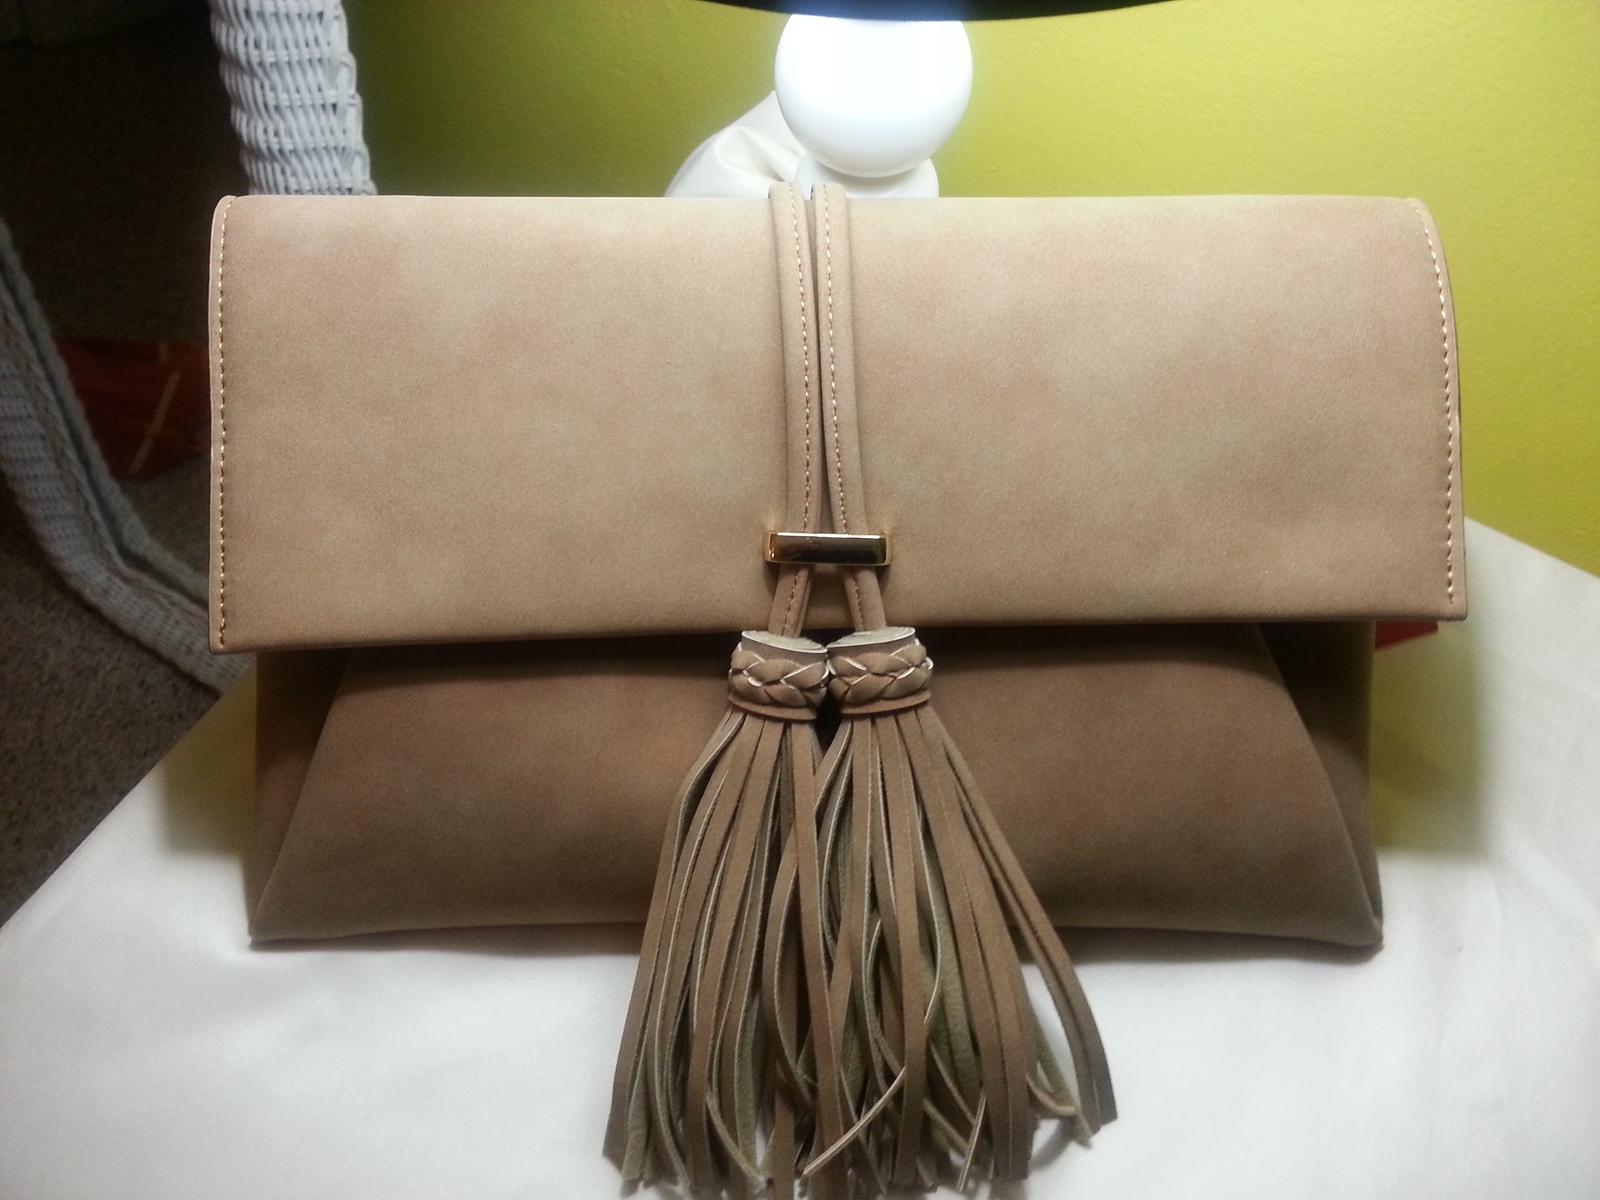 Faux Suede Tassel Clutch Bag, Ladies Purse - Camel Brown, Golden Hardware